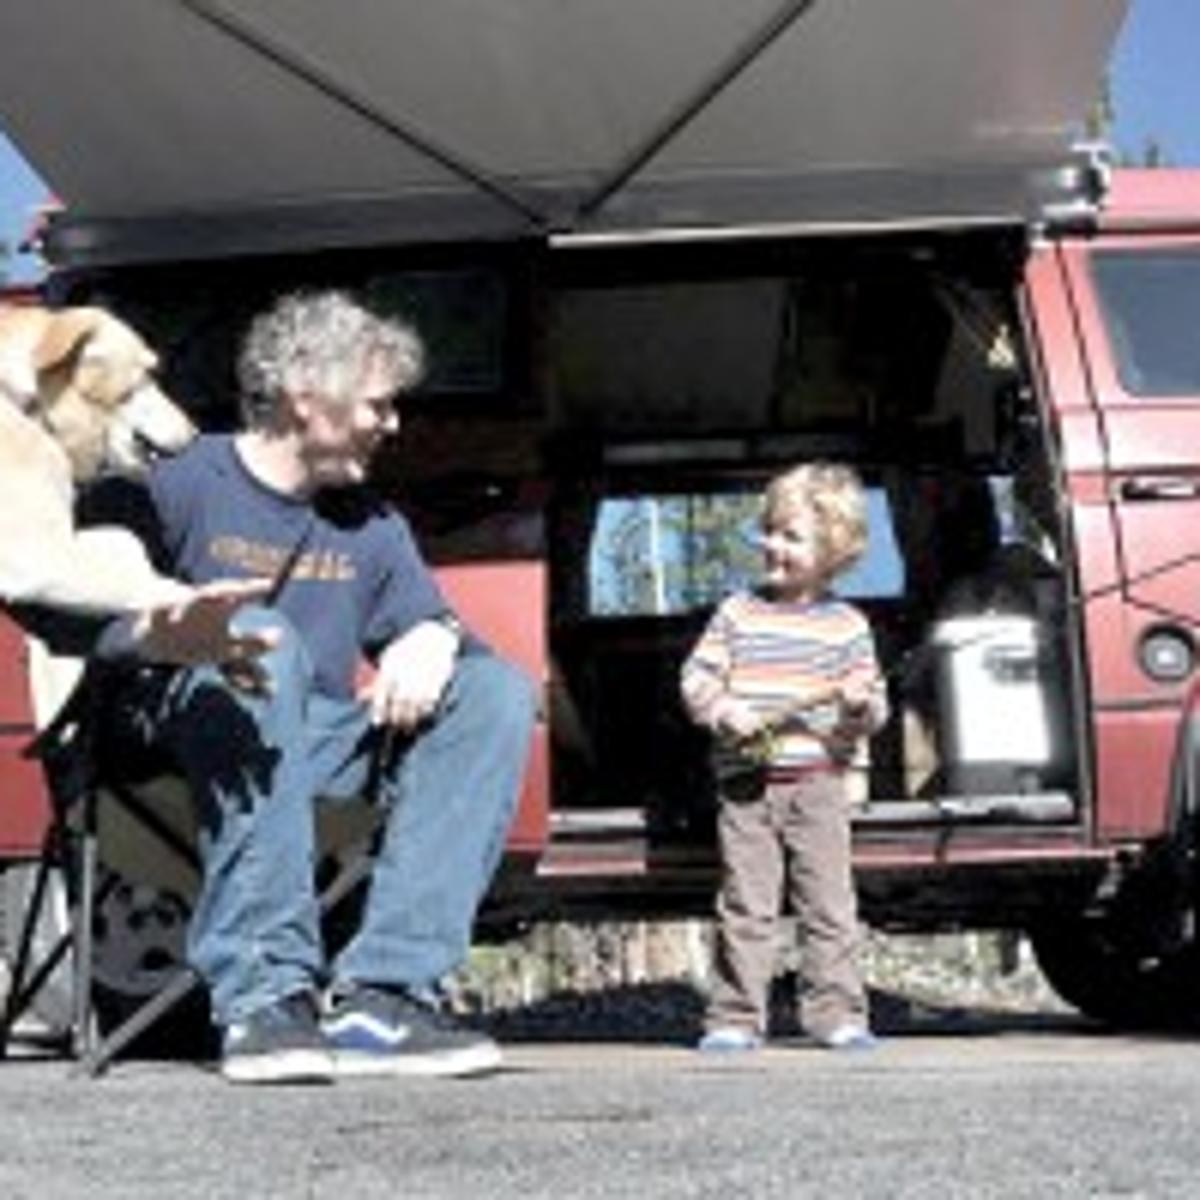 Vans to go: Coeur d'Alene, Idaho, man restores and rents